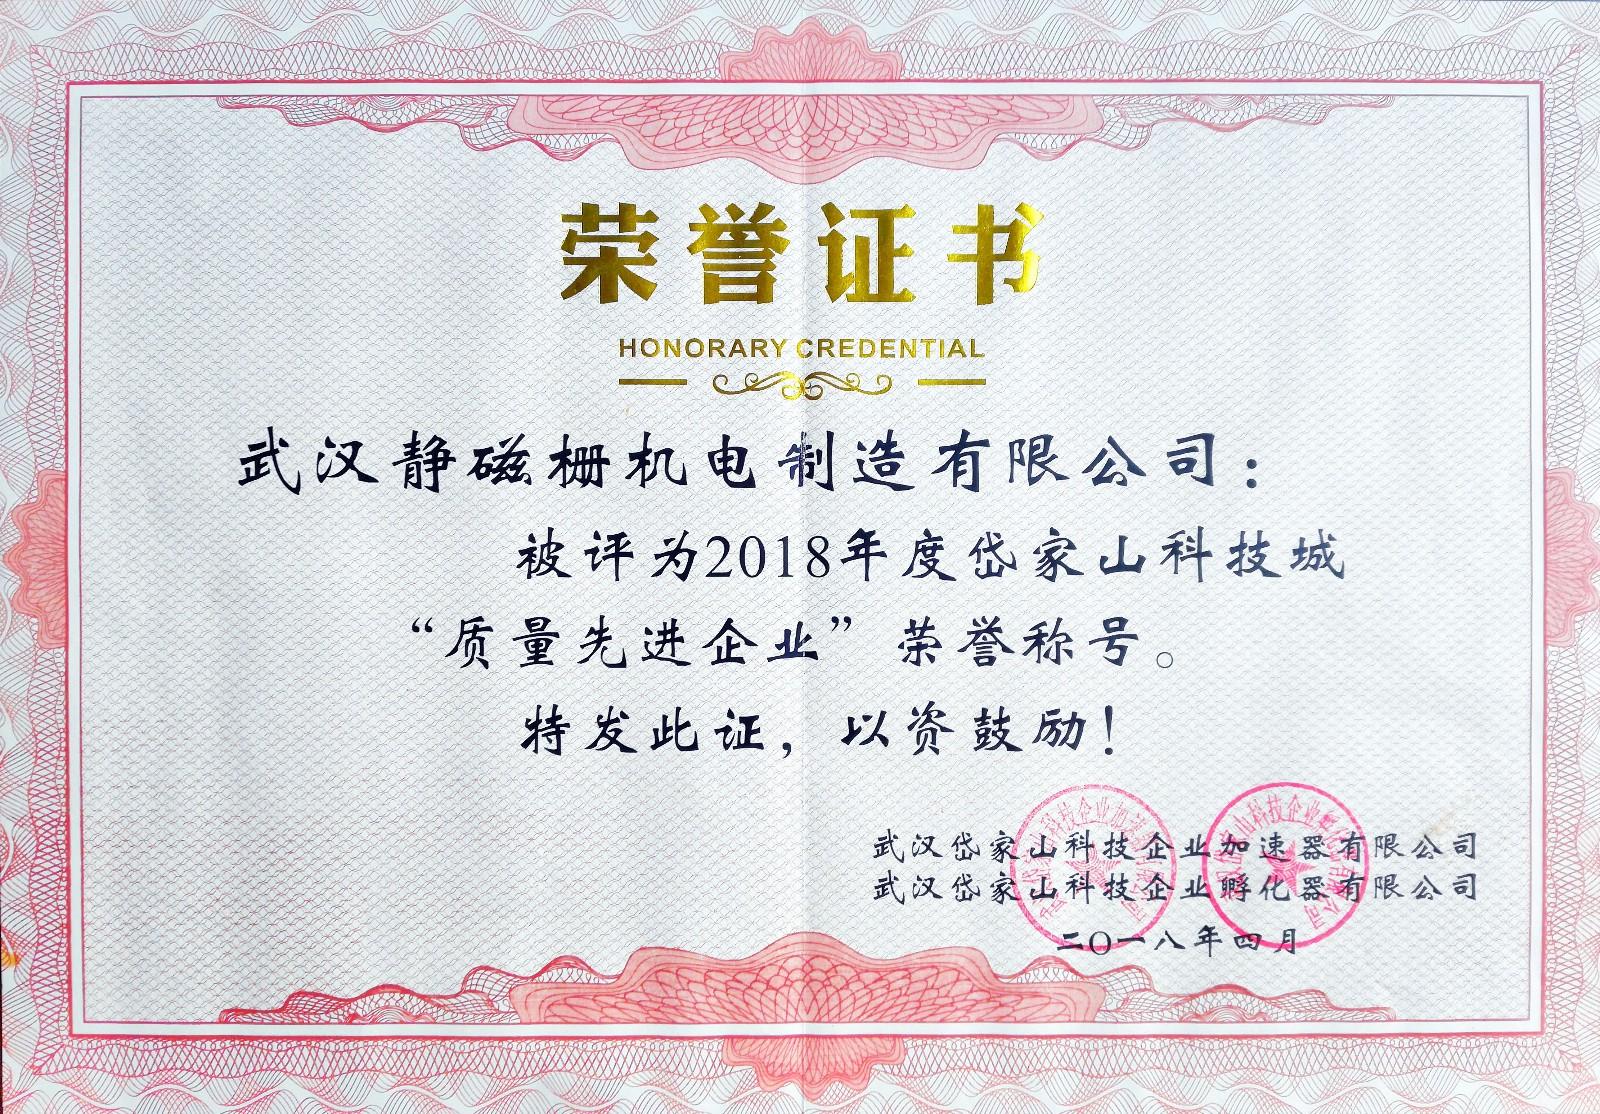 JCS武汉静磁栅质量先进企业证书